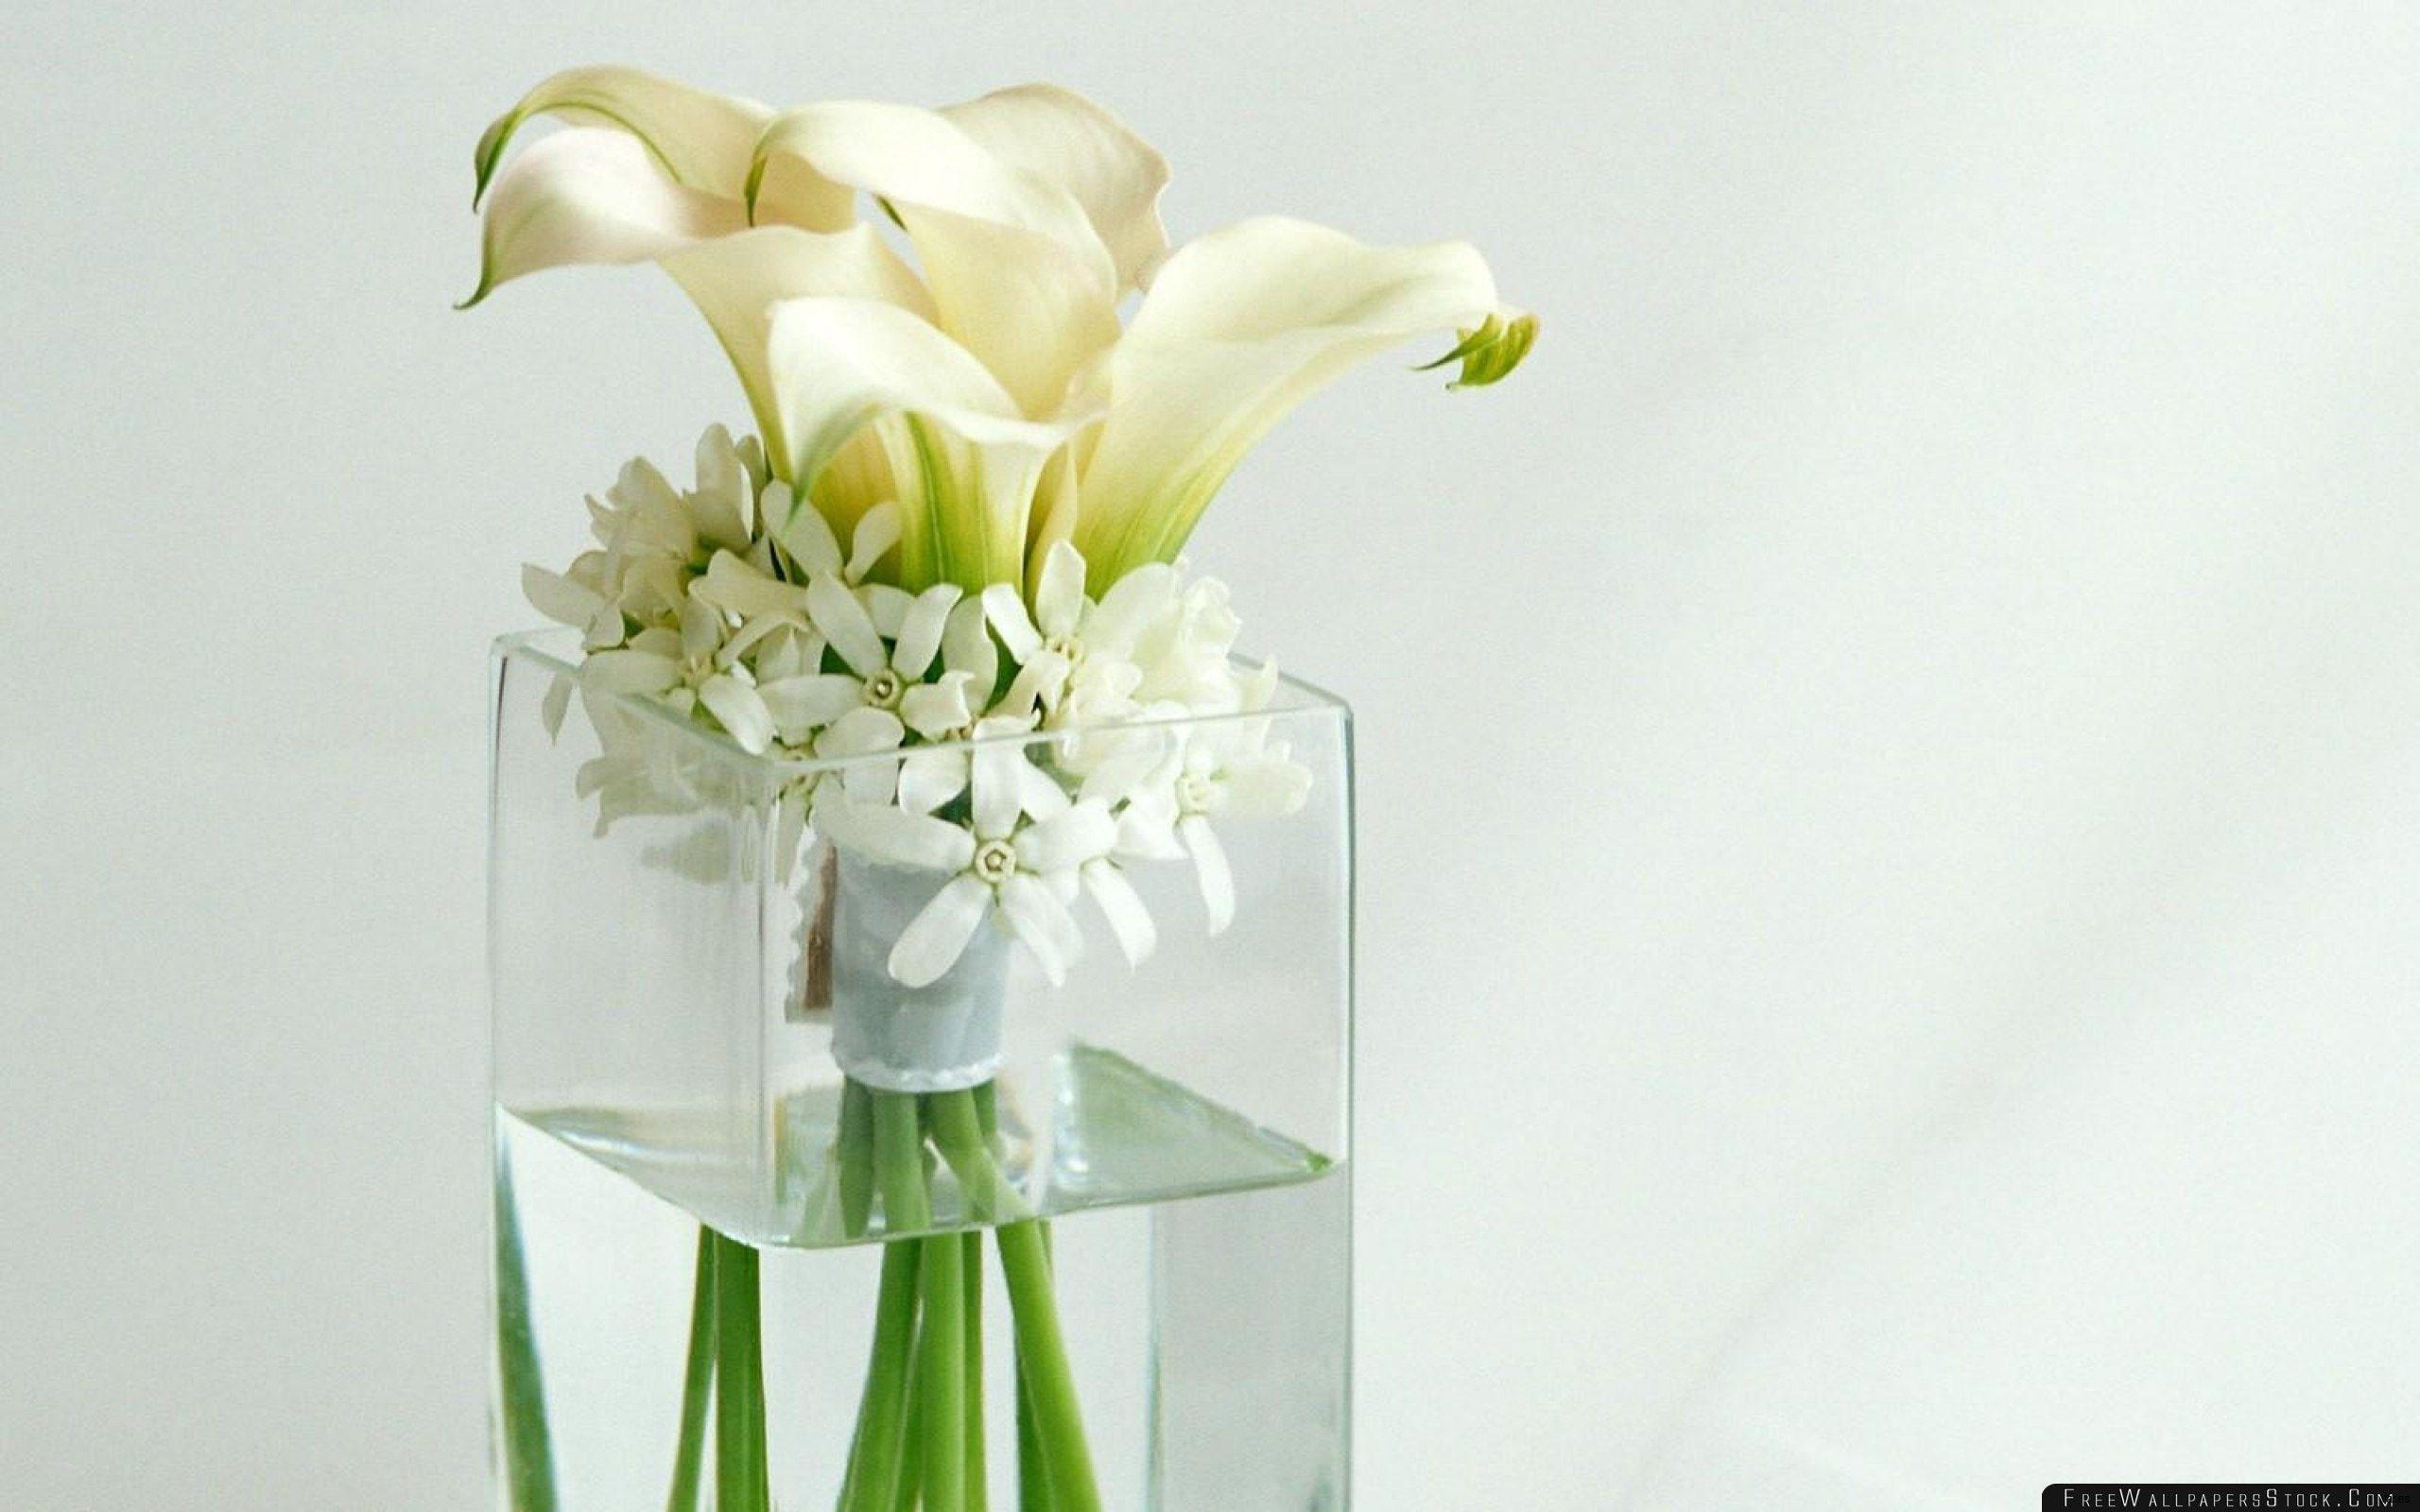 extra large glass flower vases of 34 gold mercury glass vases the weekly world with 34 gold mercury glass vases